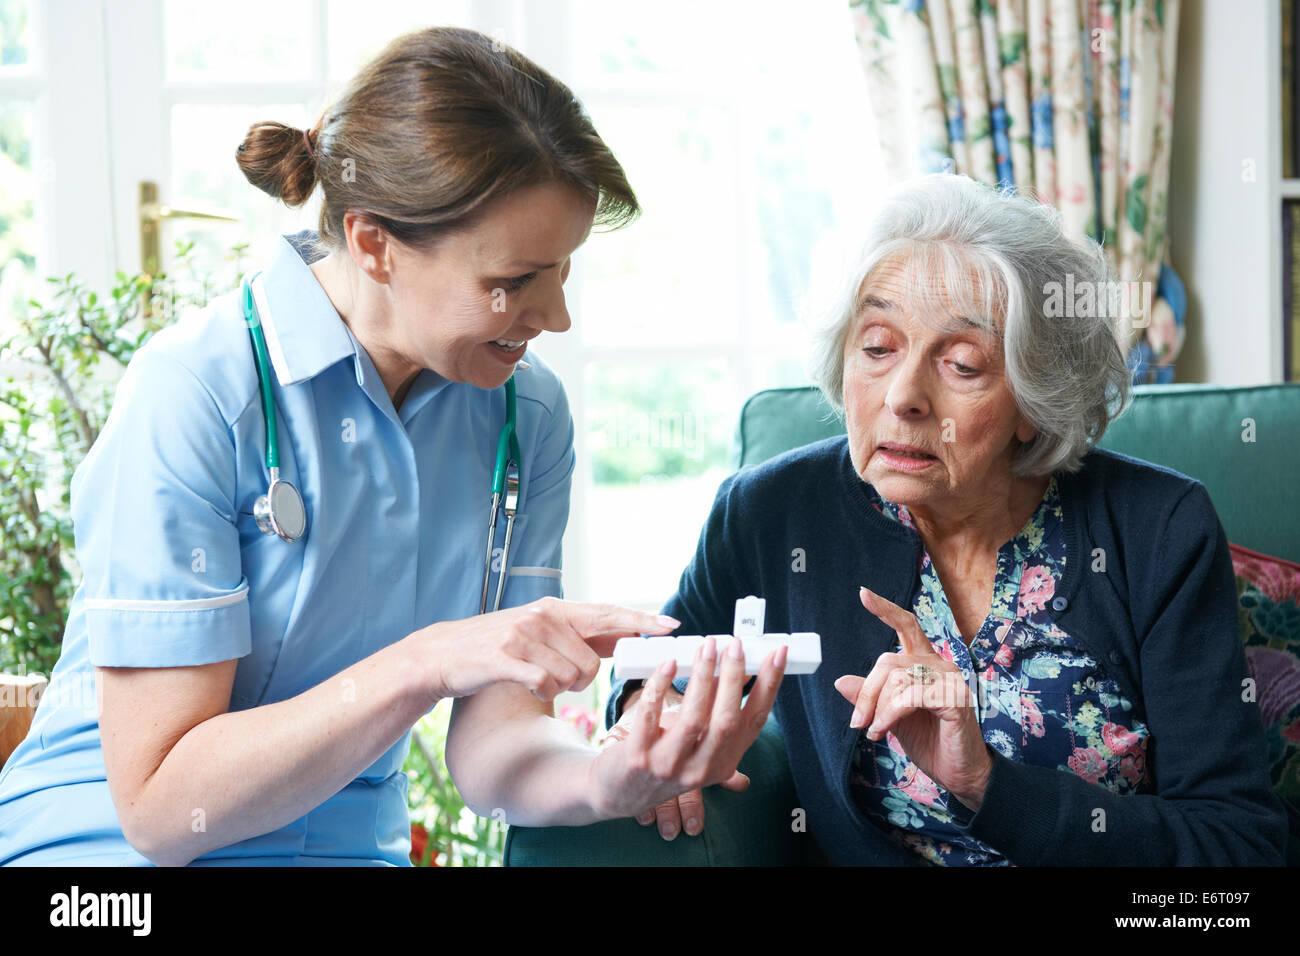 Nurse Advising Senior Woman On Medication At Home Stock Photo